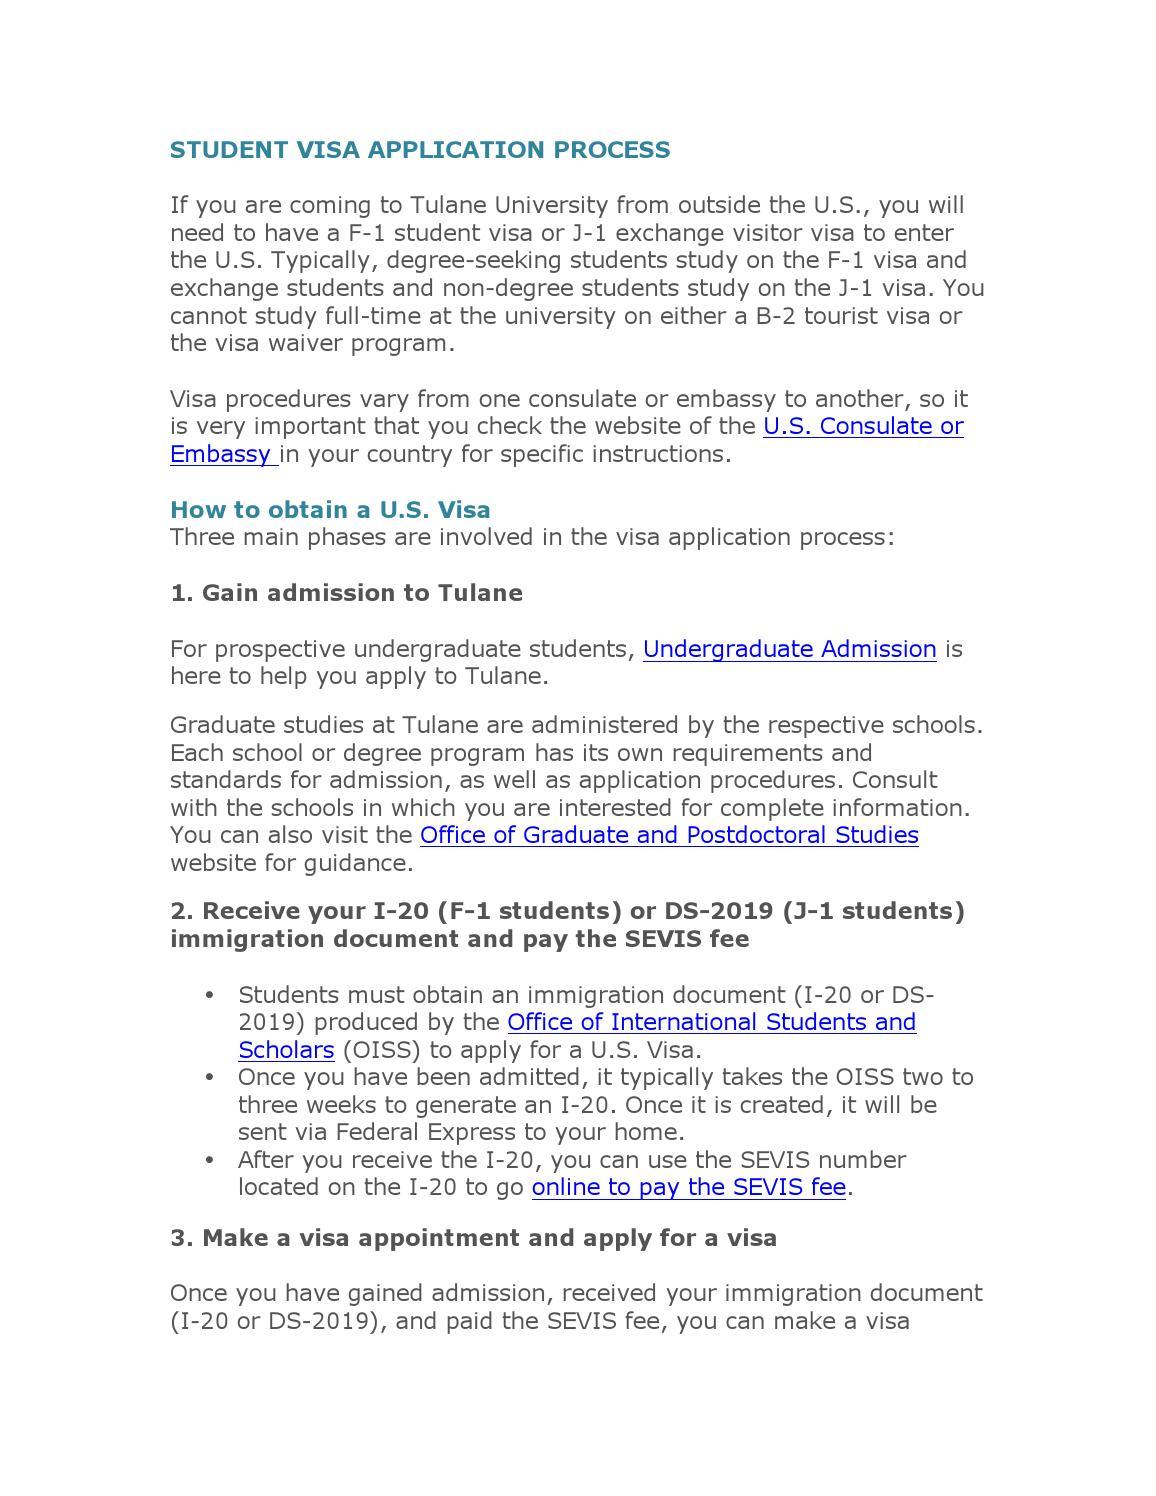 canada student visa application process